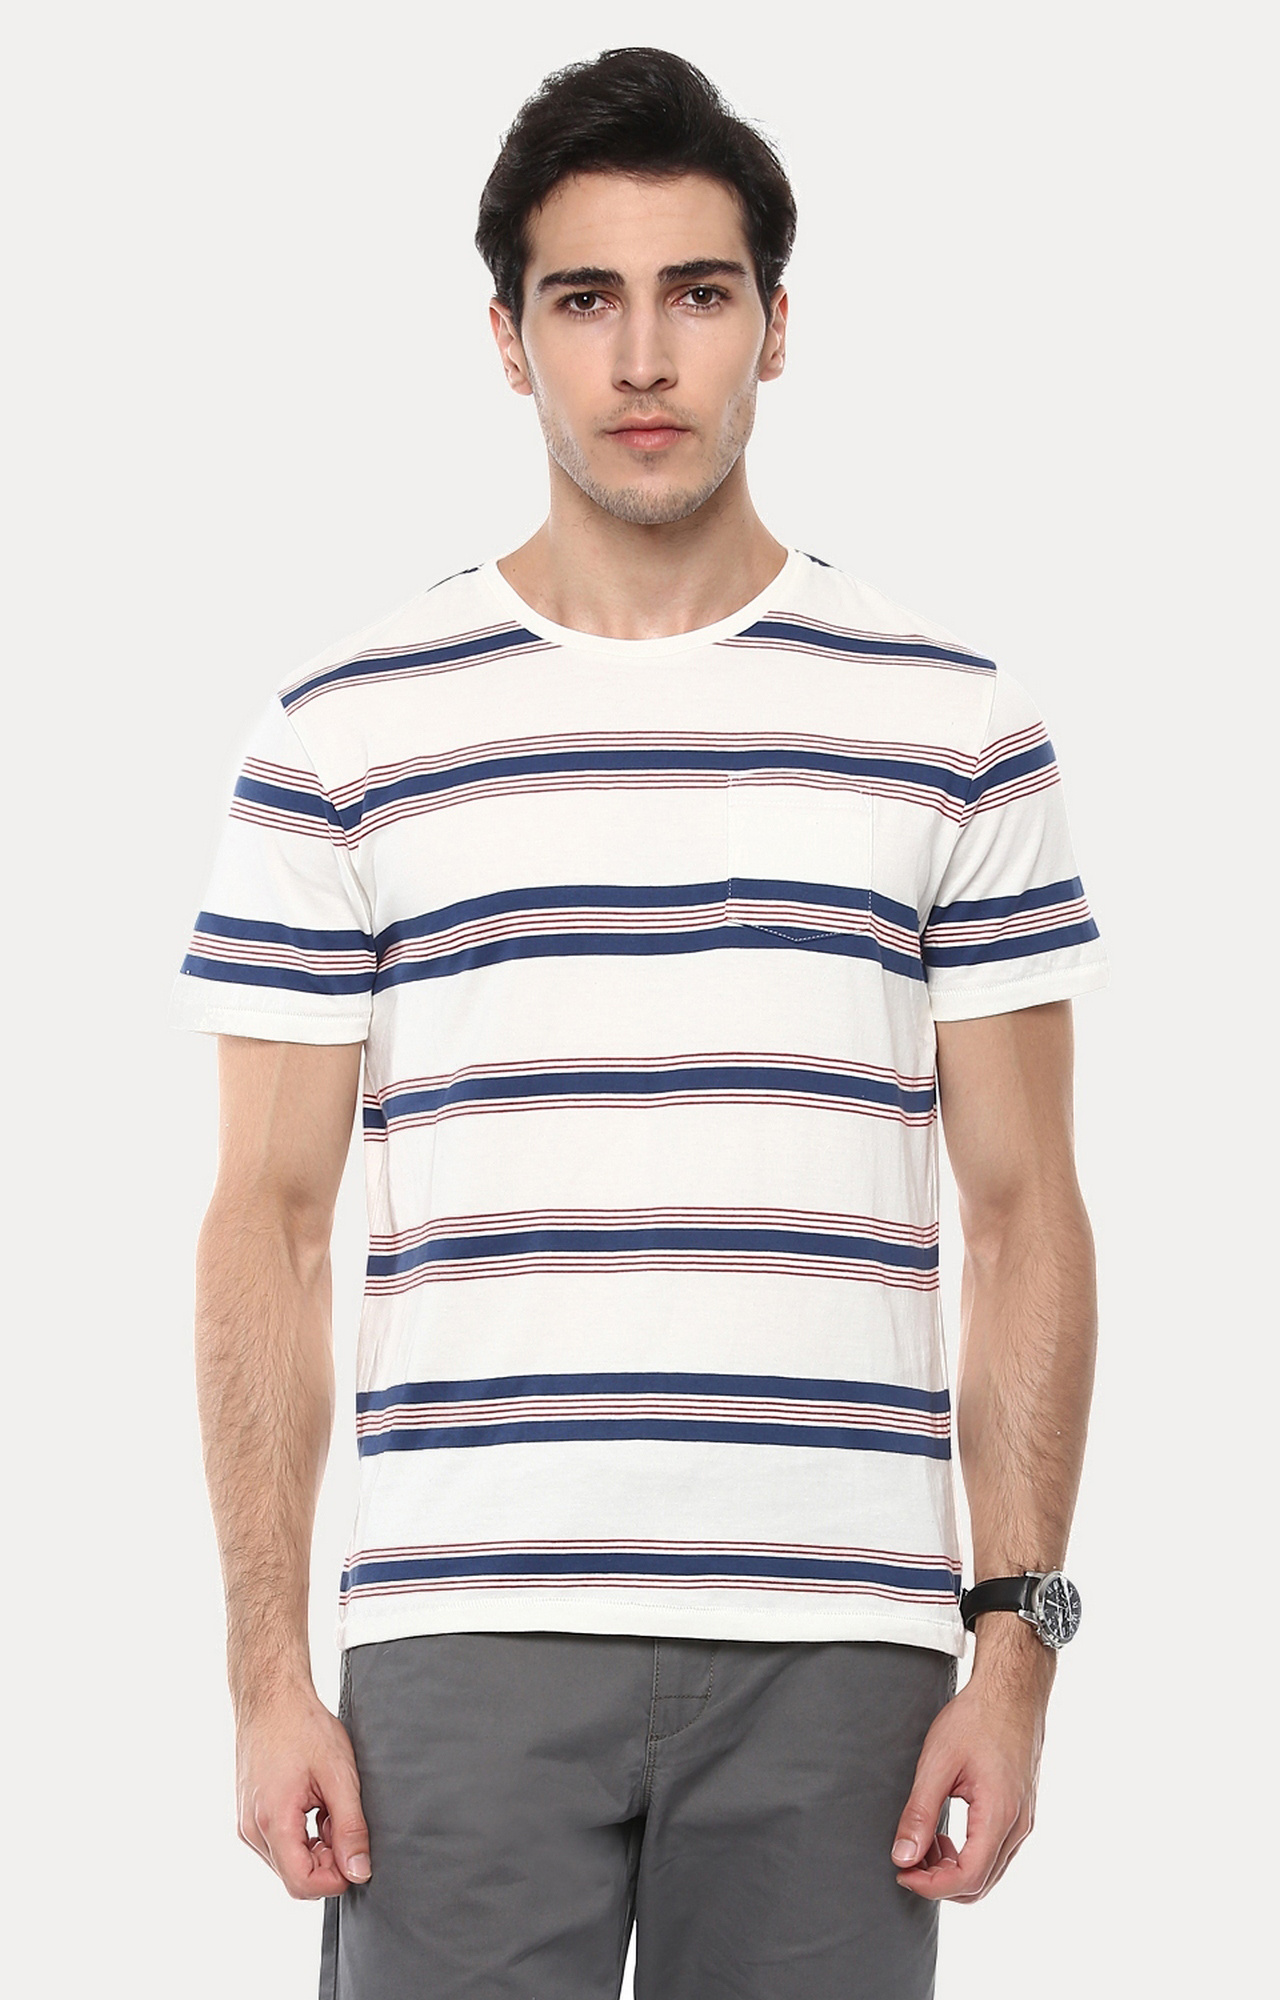 celio   Jebritain White and Blue Striped T-Shirt